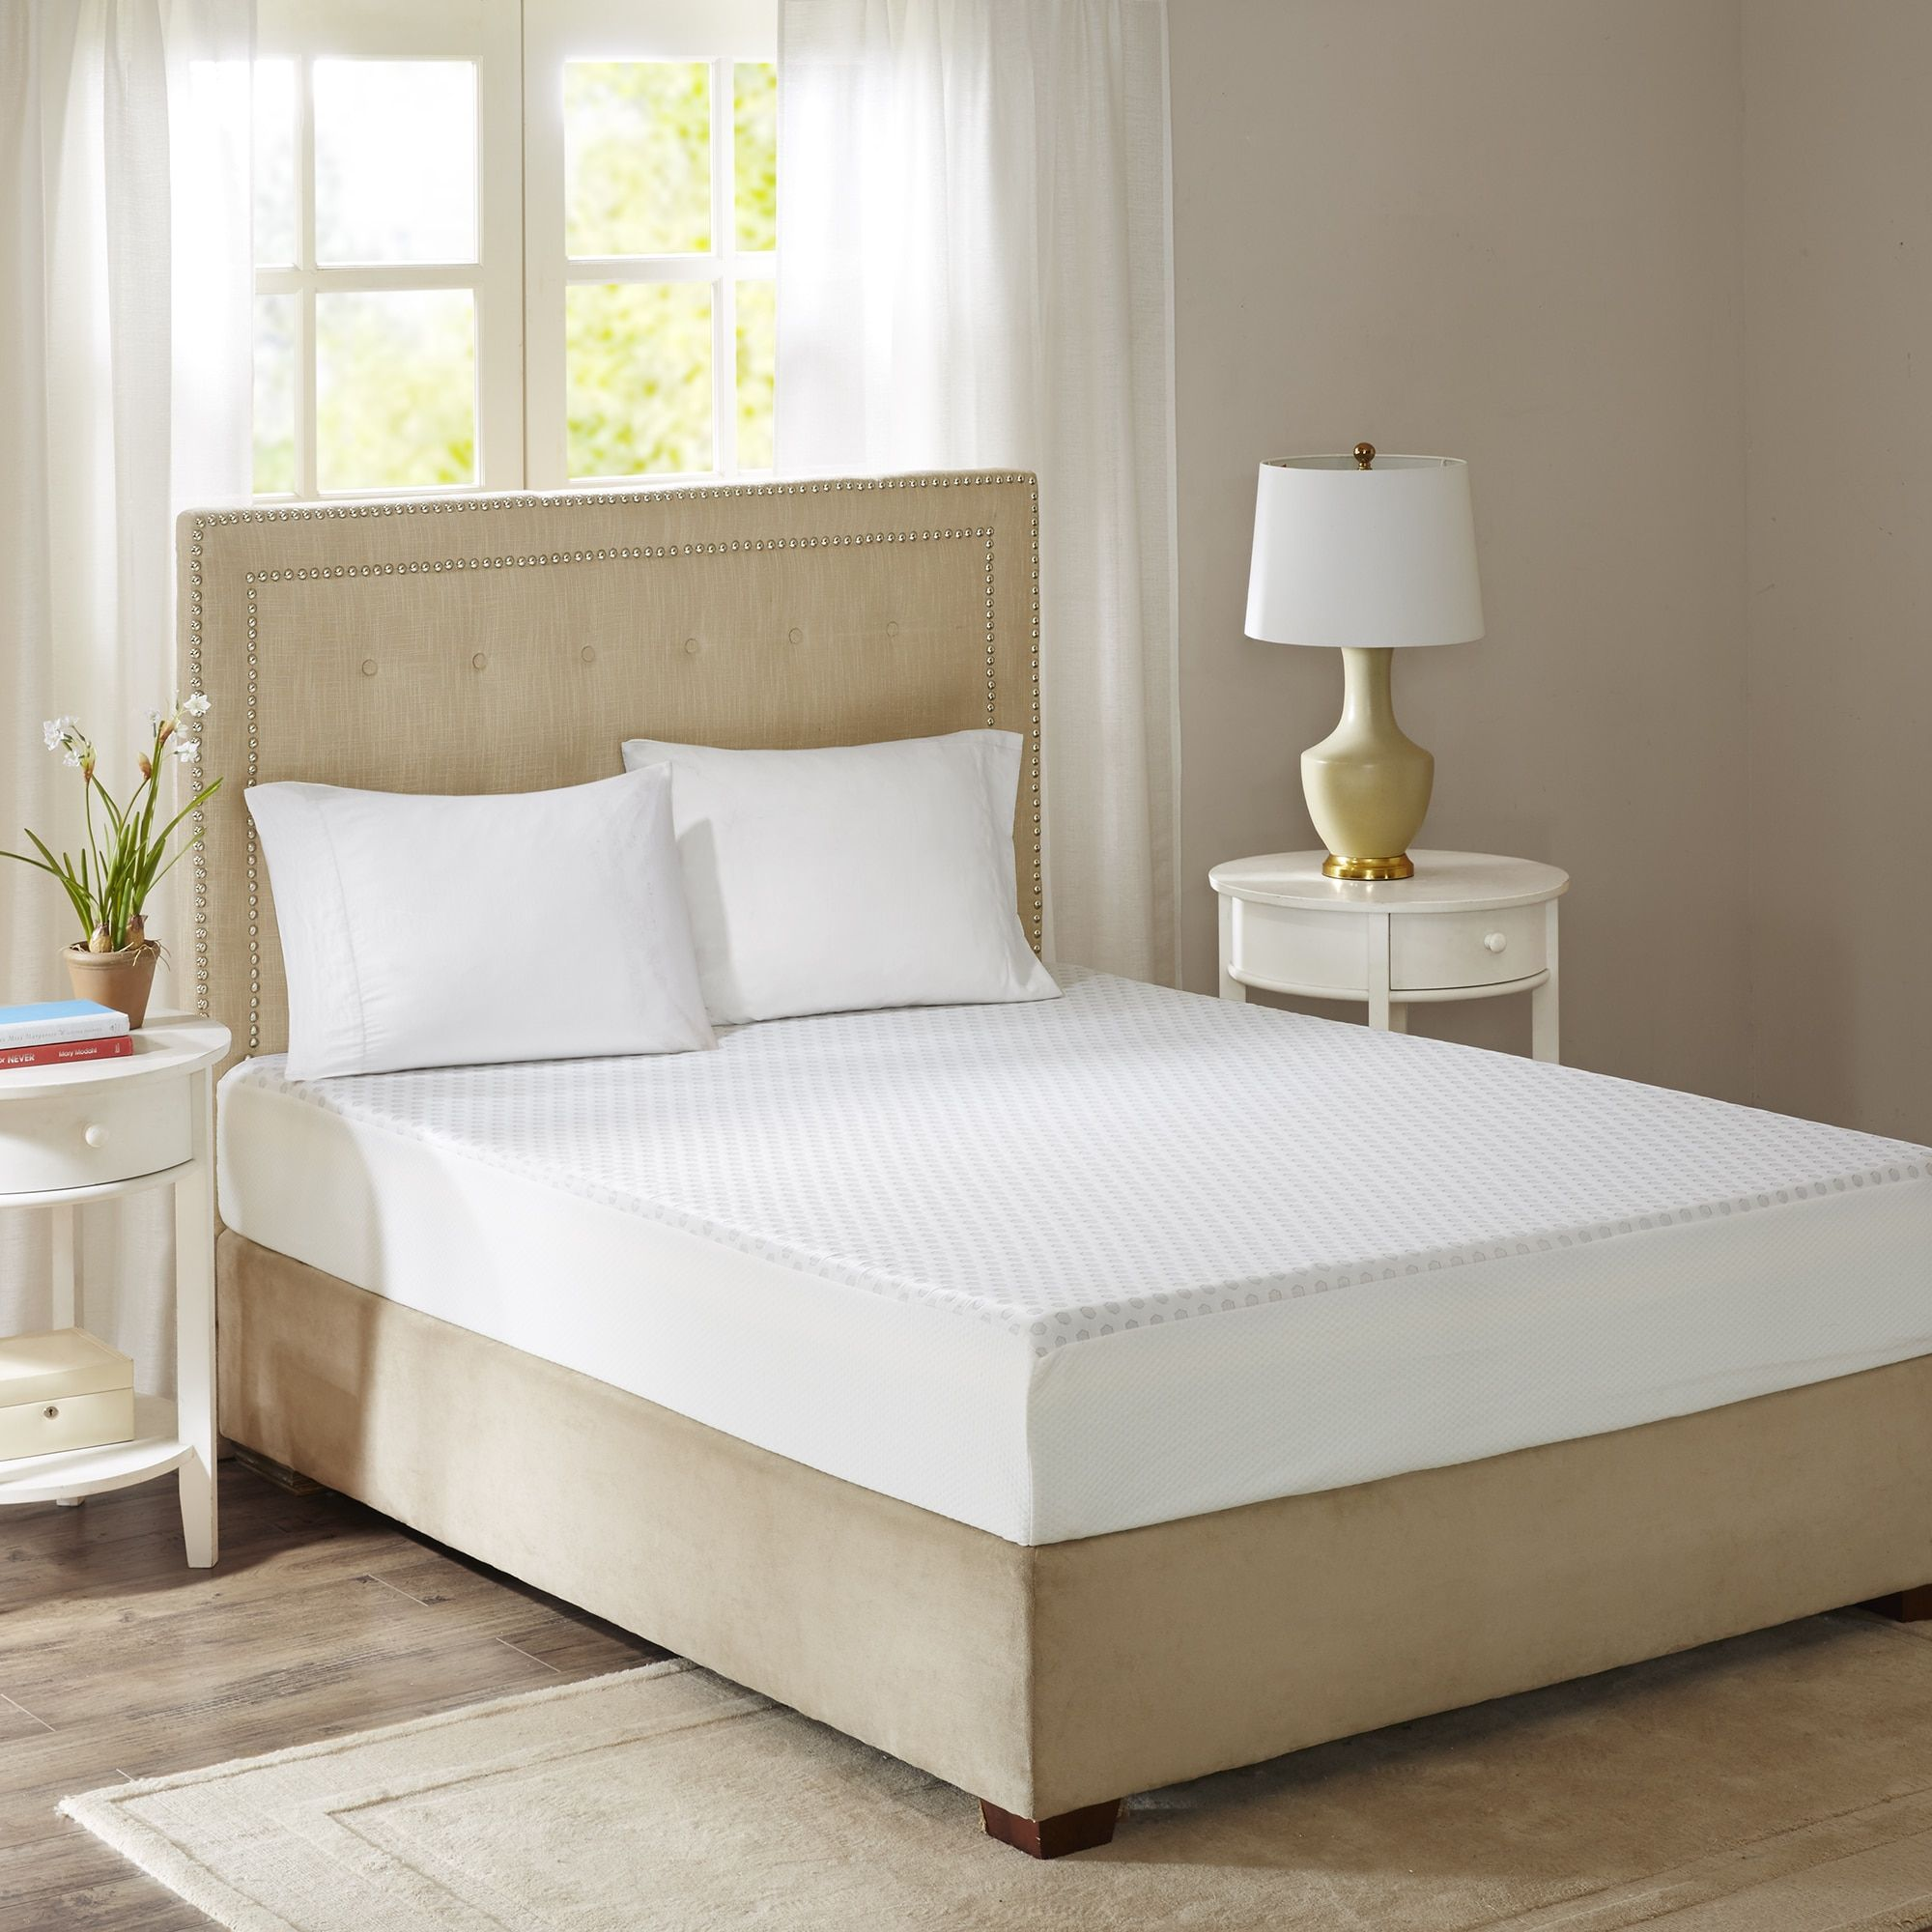 adjustable a novaform split king mattresses serafina mattress is what